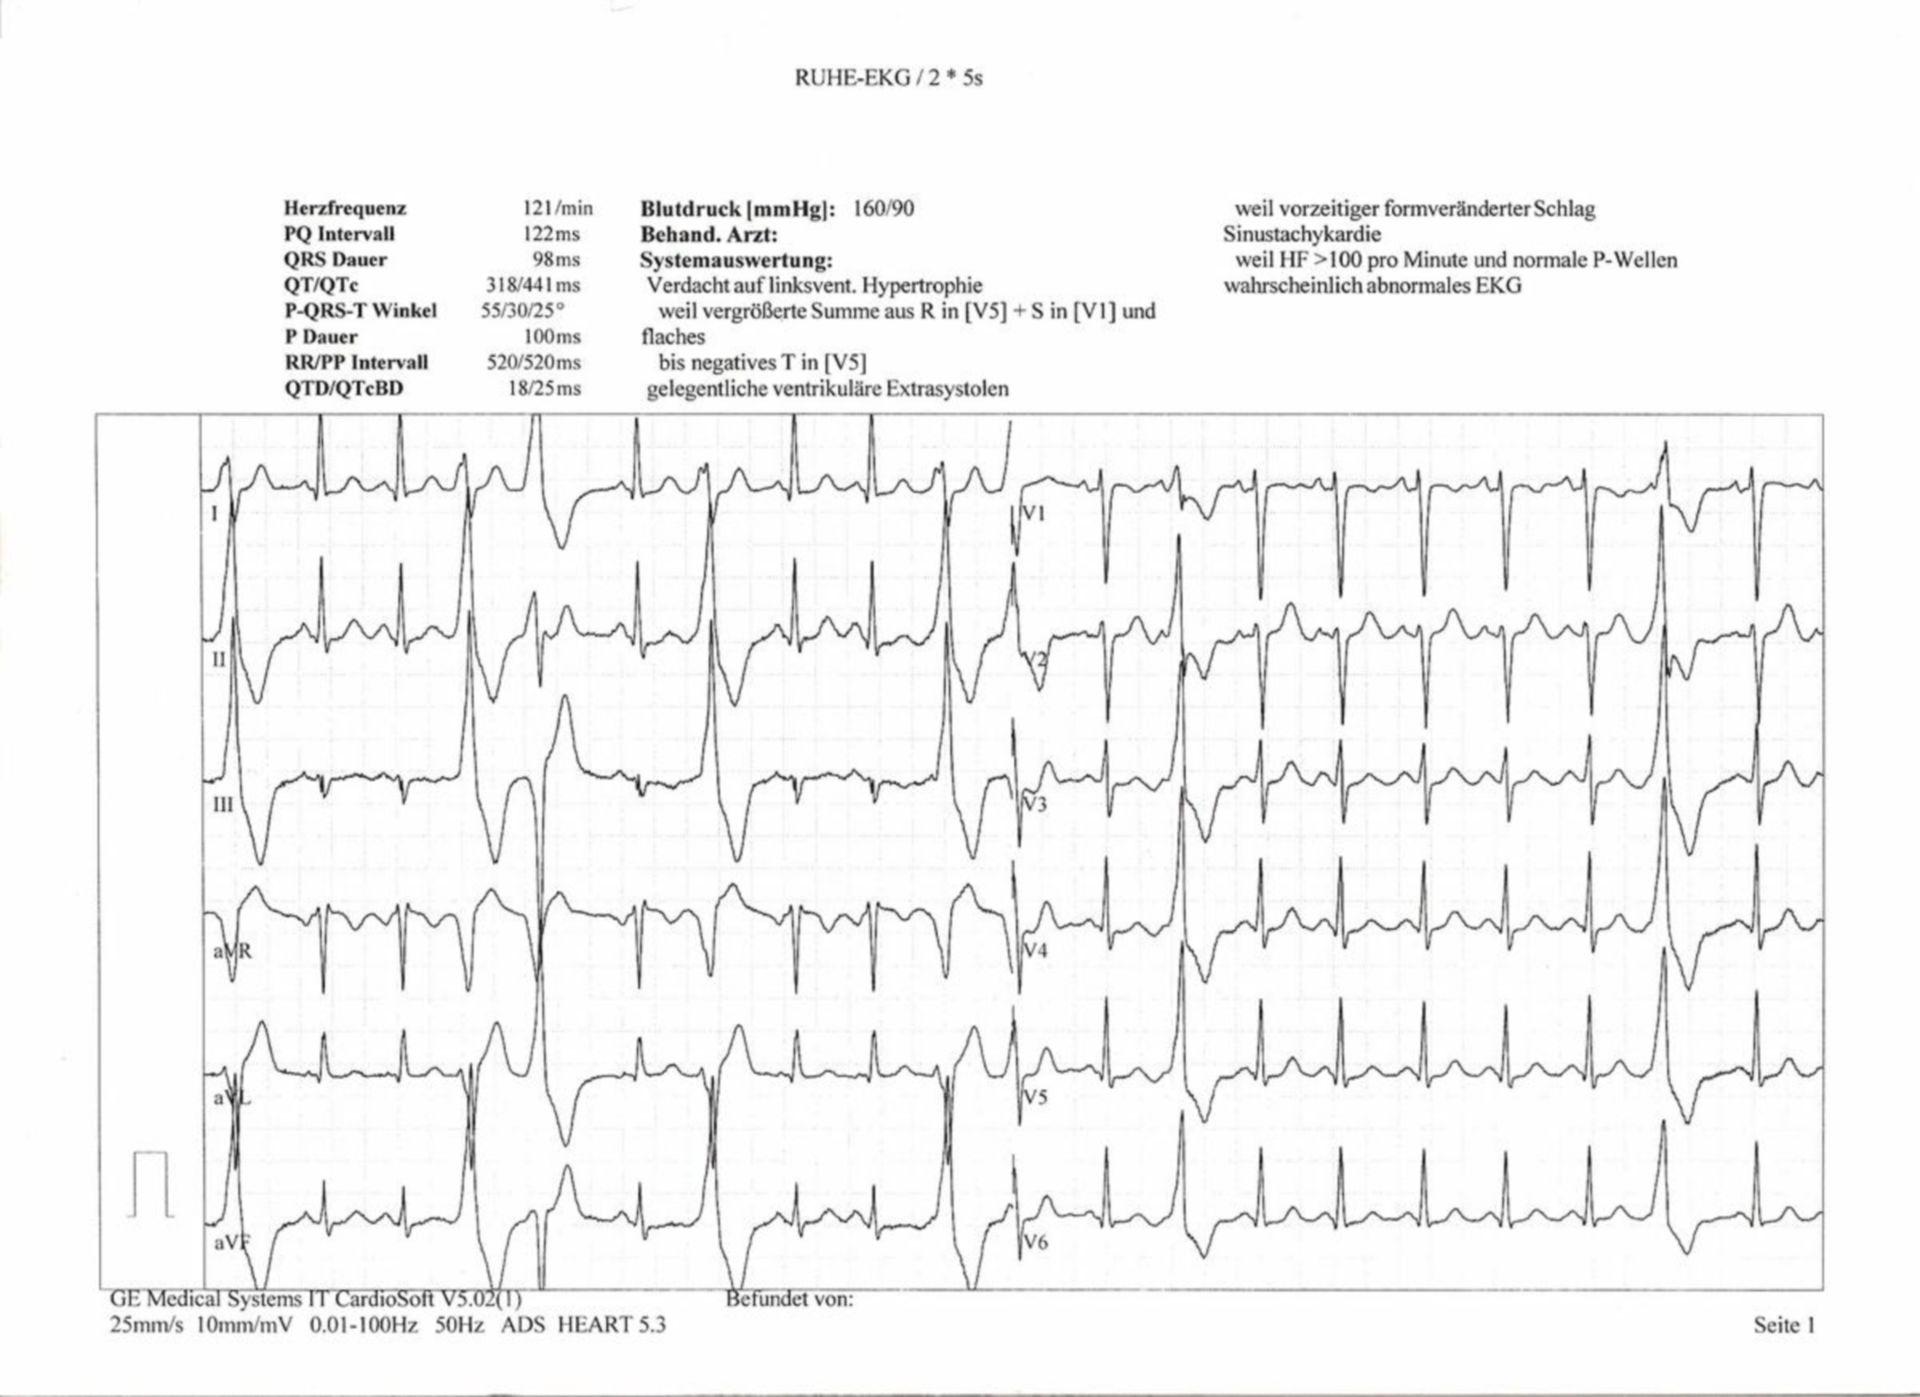 Pathological 12-Lead ECG